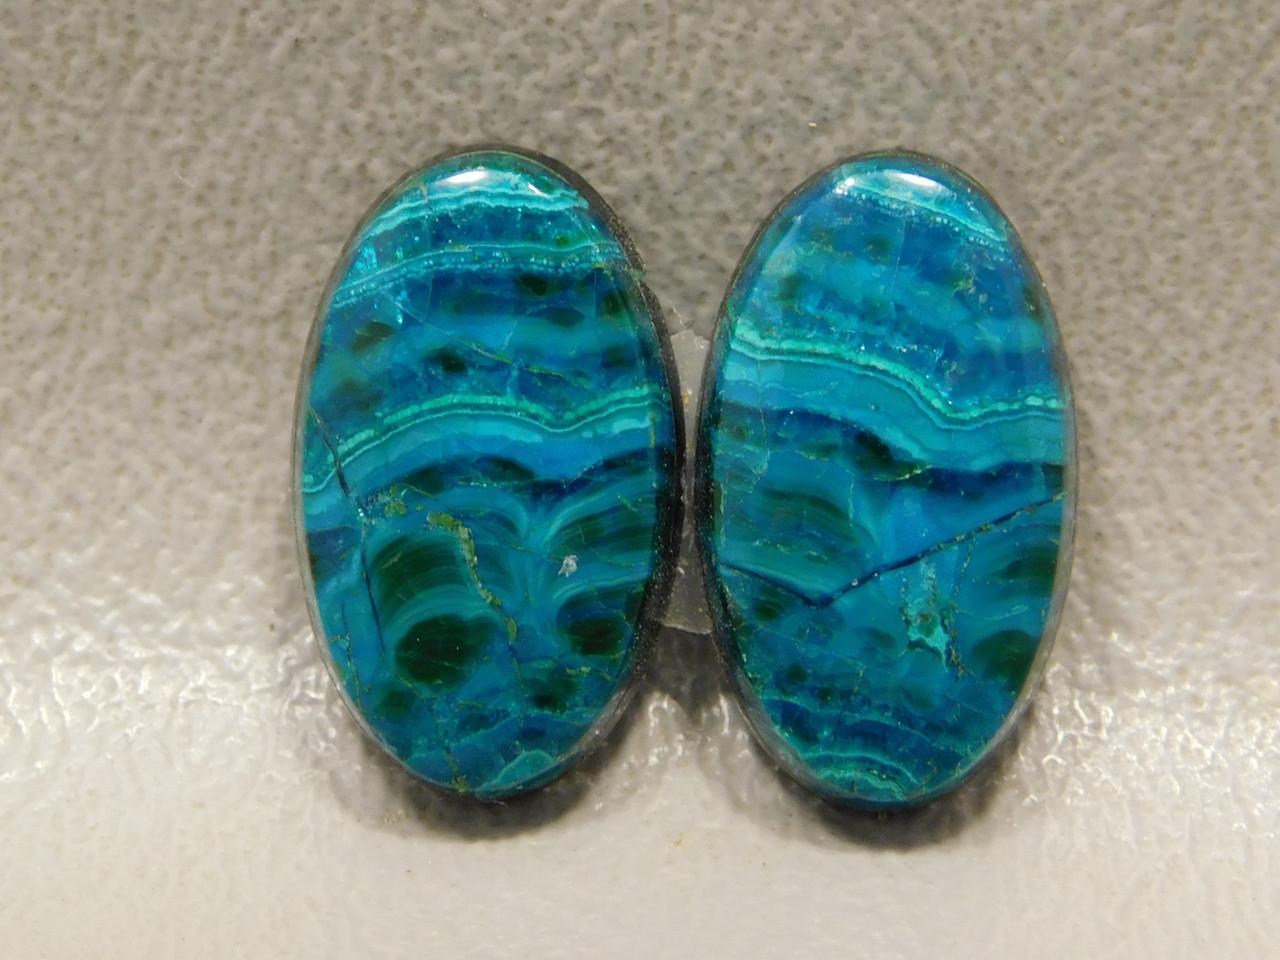 Chrysocolla Malachite Pairs Ovals Stones Cabochons Arizona #30